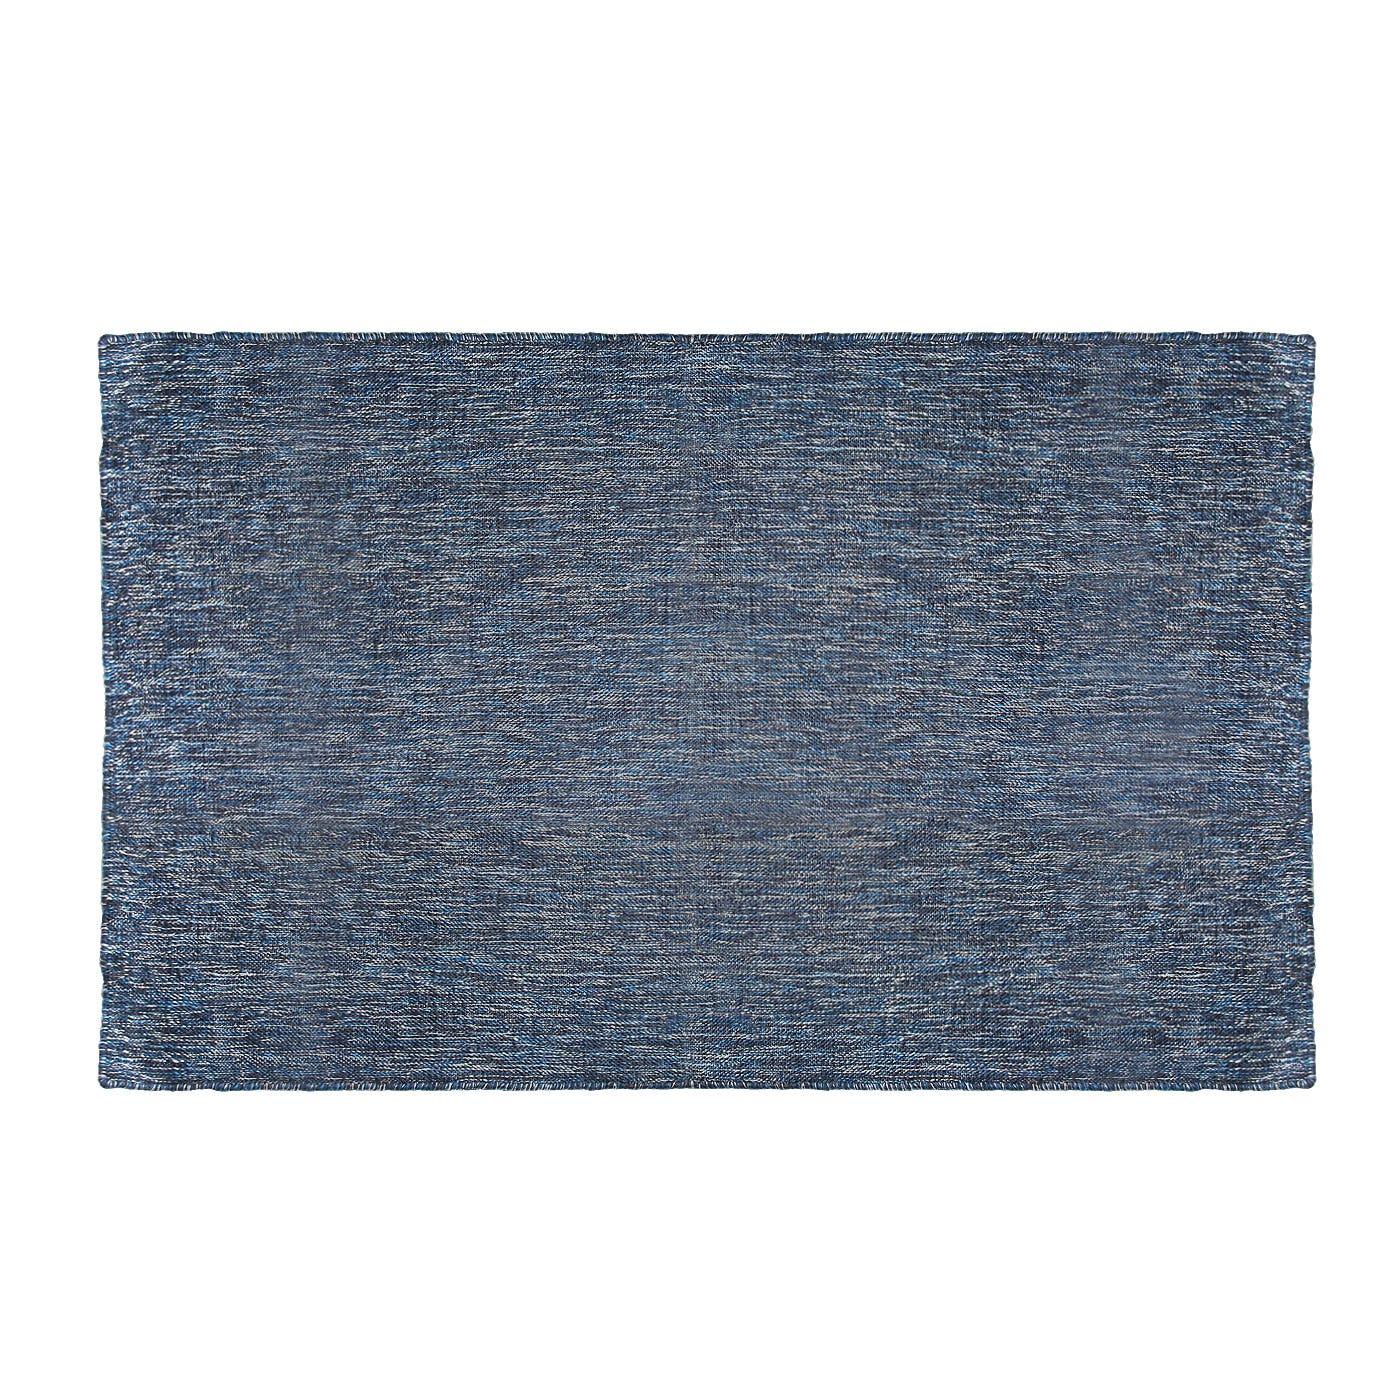 golf ' x ' large rug  large outdoor rugs  blu dot - previous image golf ' x ' modern outdoor rug  denim